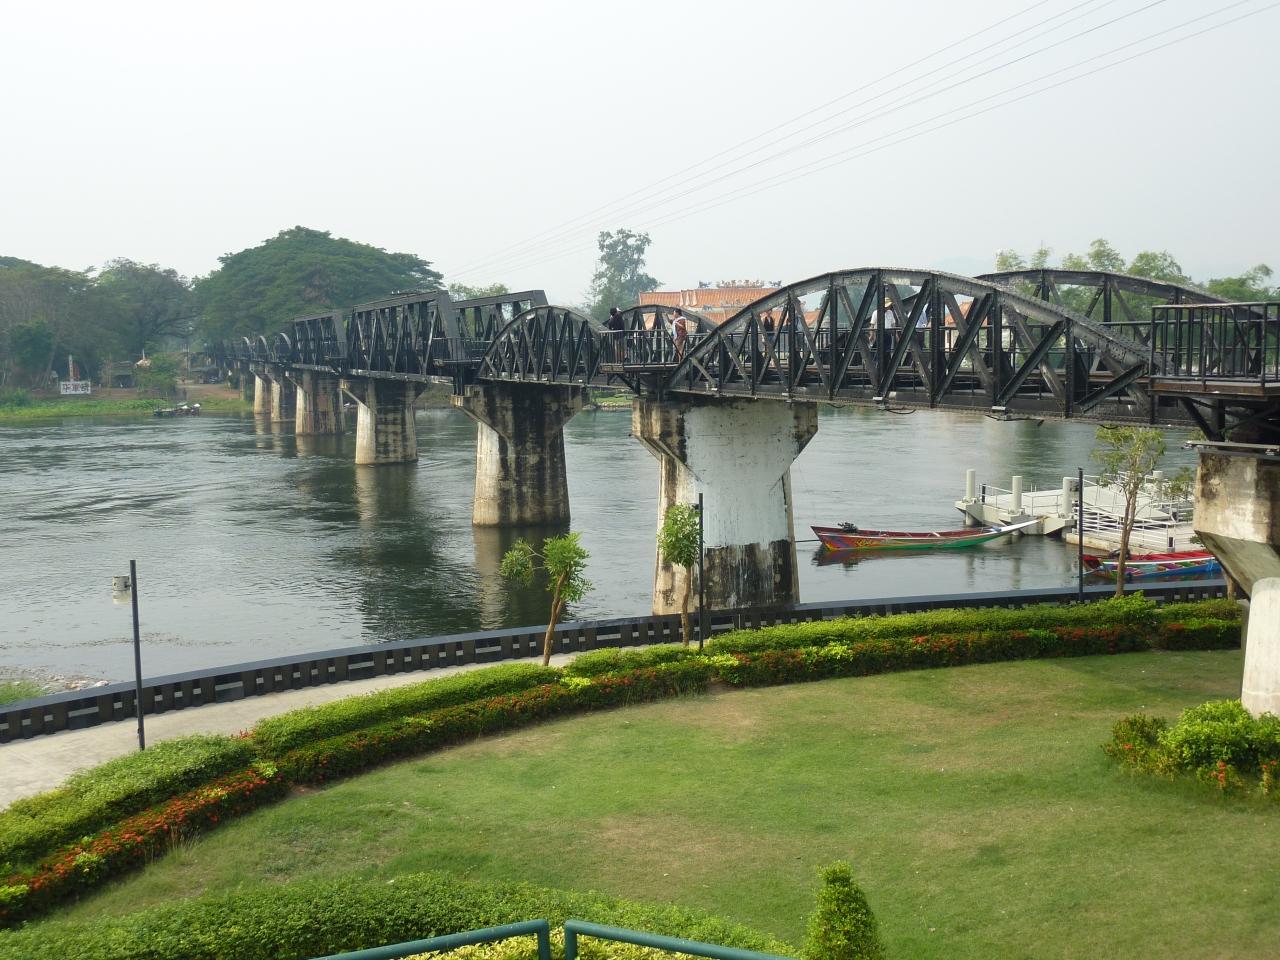 Kanchanaburi en Ayutthaya: steden volhistorie